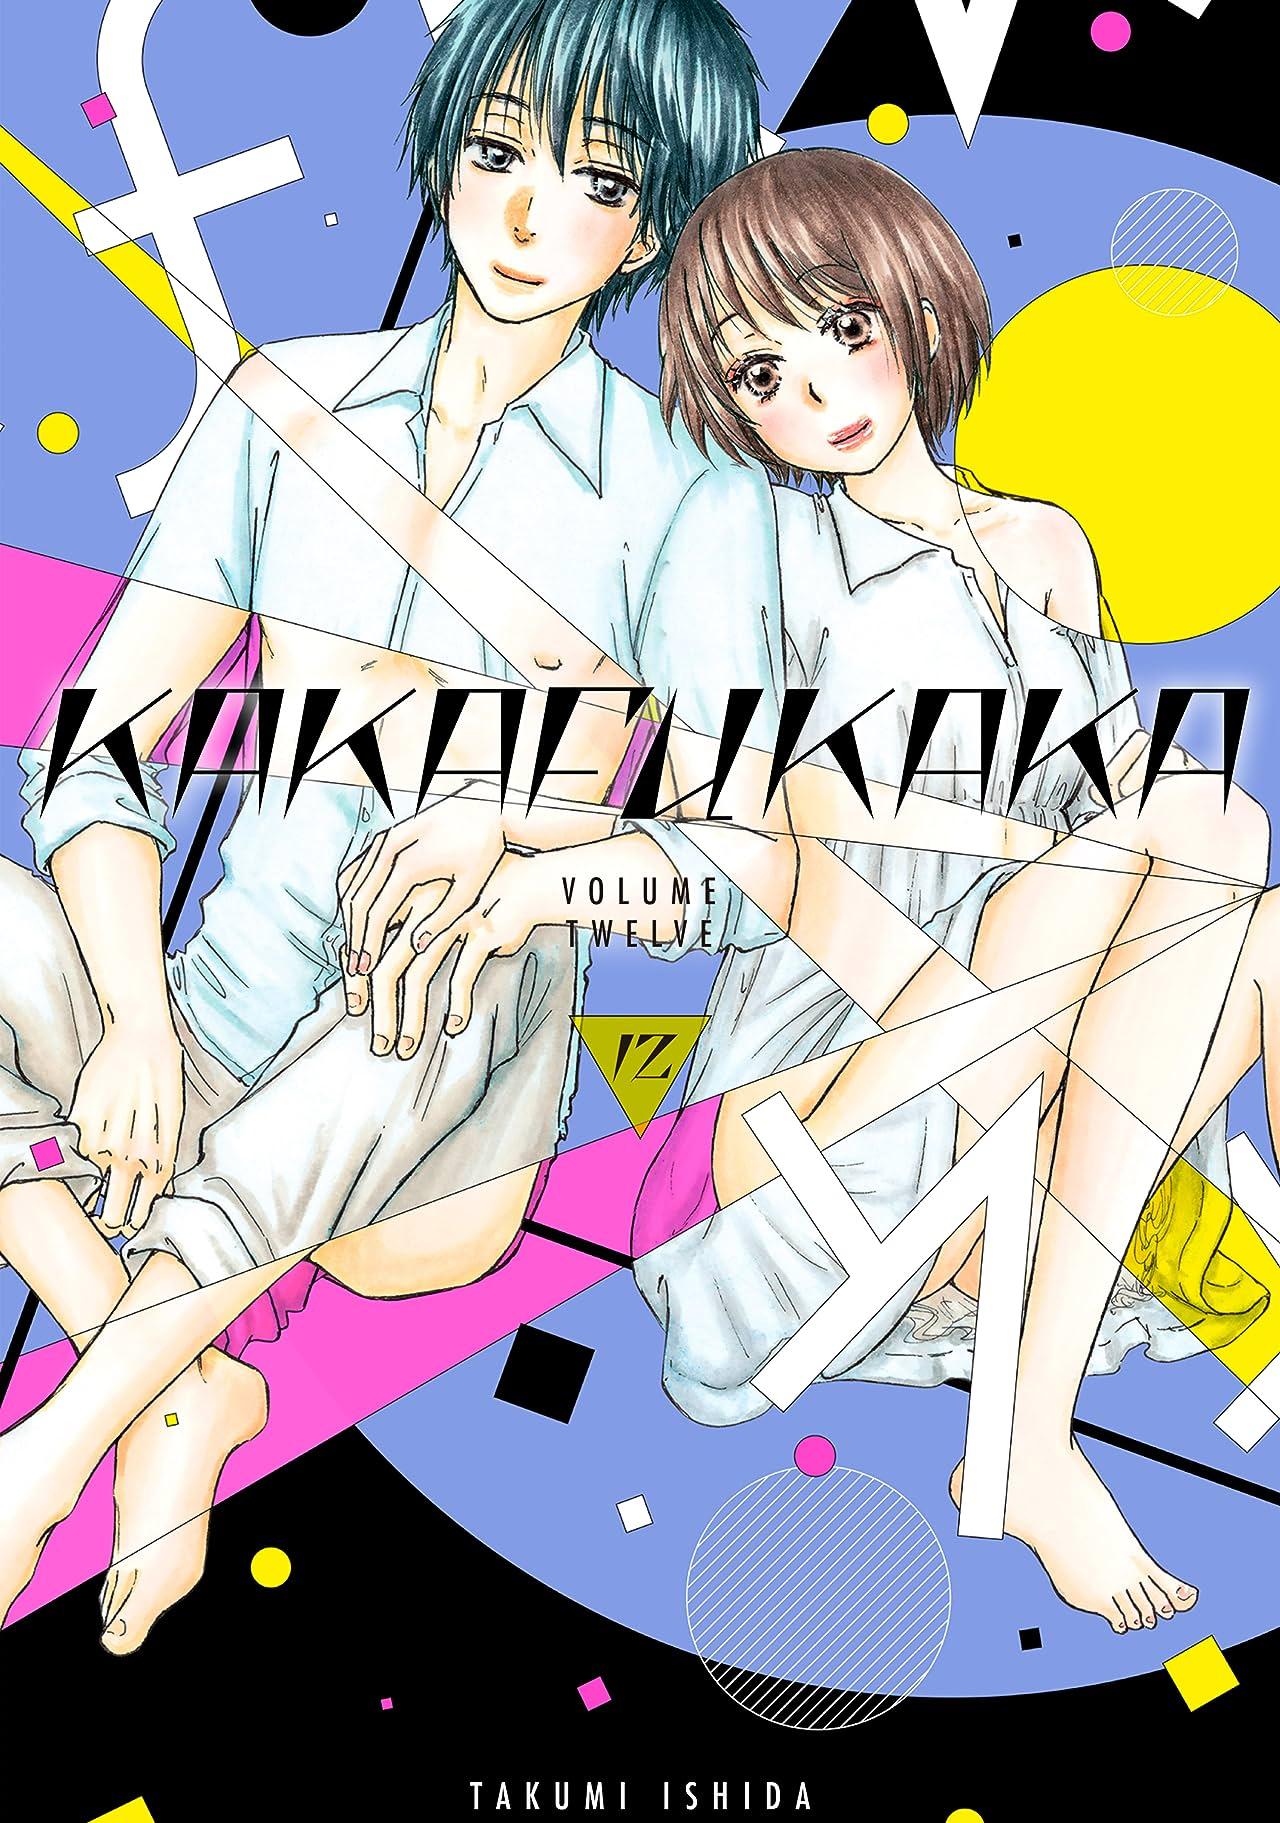 Kakafukaka Vol. 12